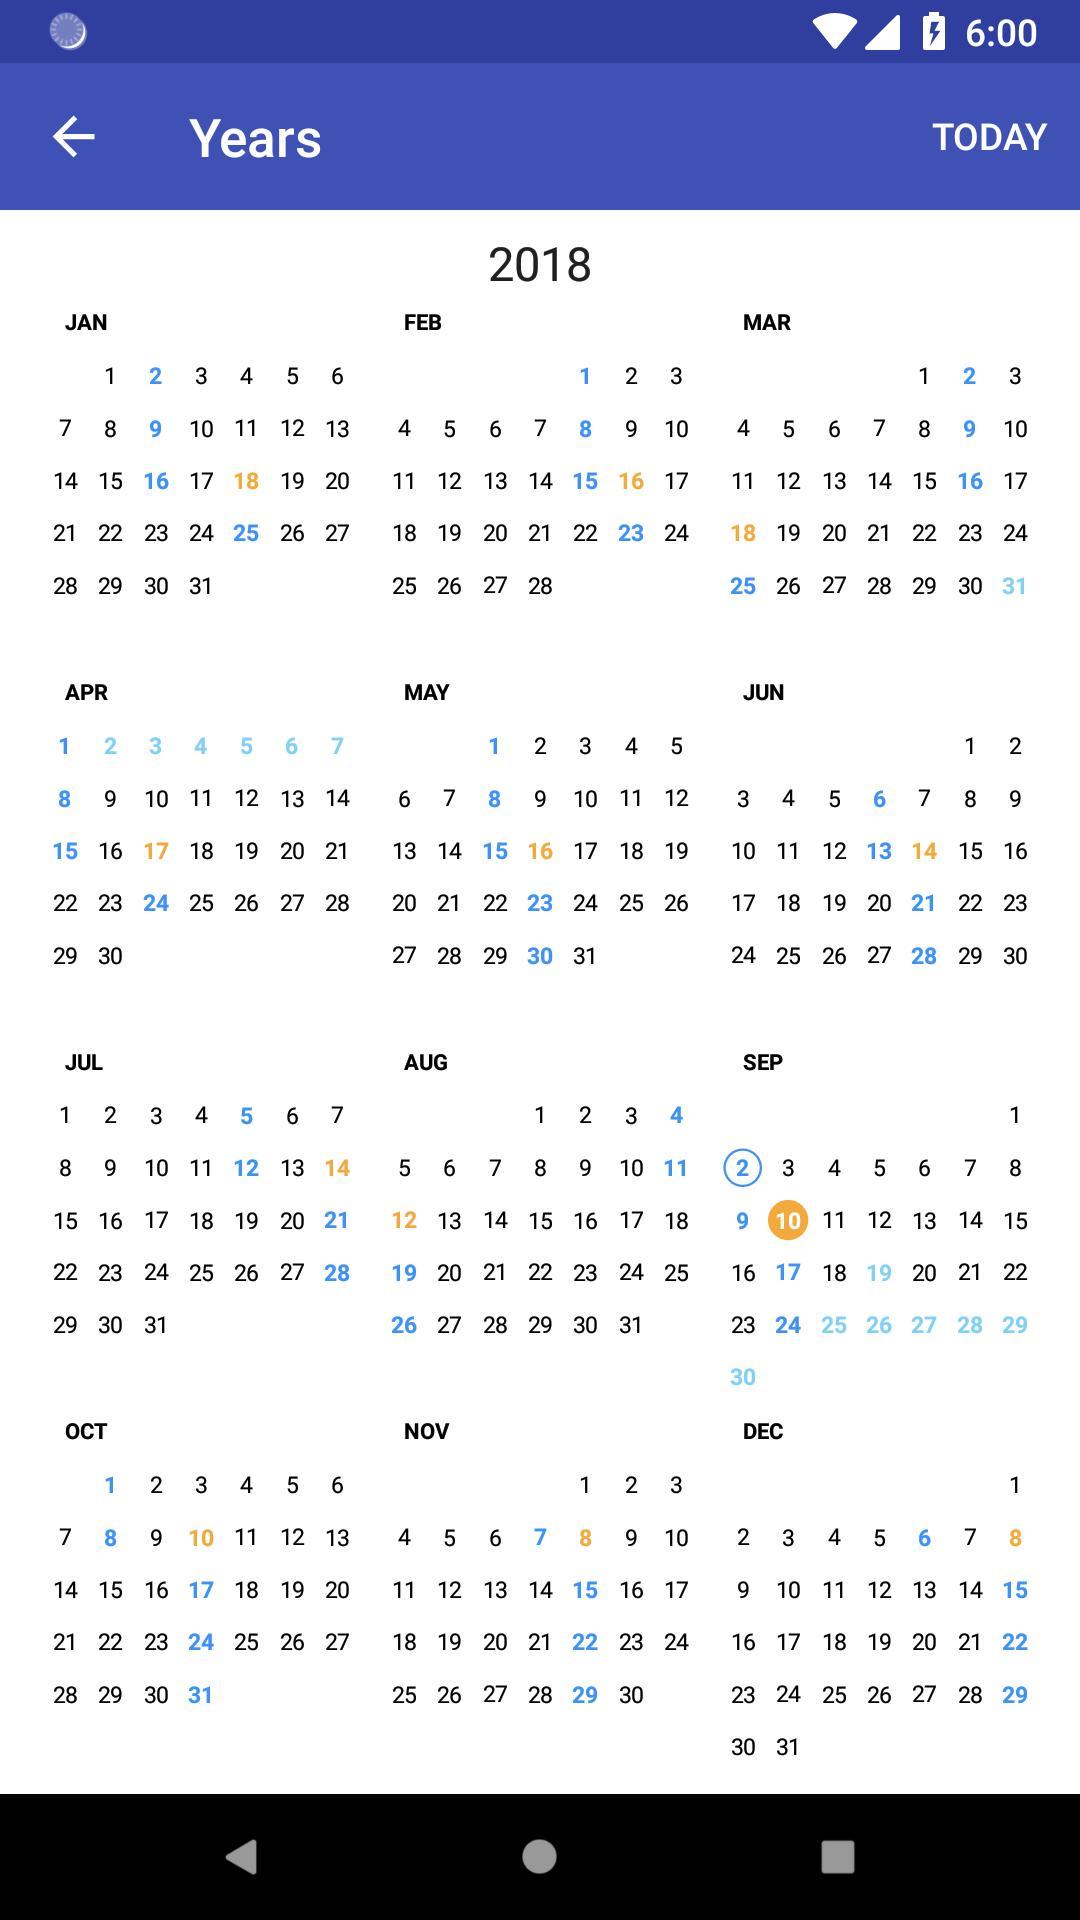 Biblical Calendar.Wlc Biblical Calendar For Android Apk Download